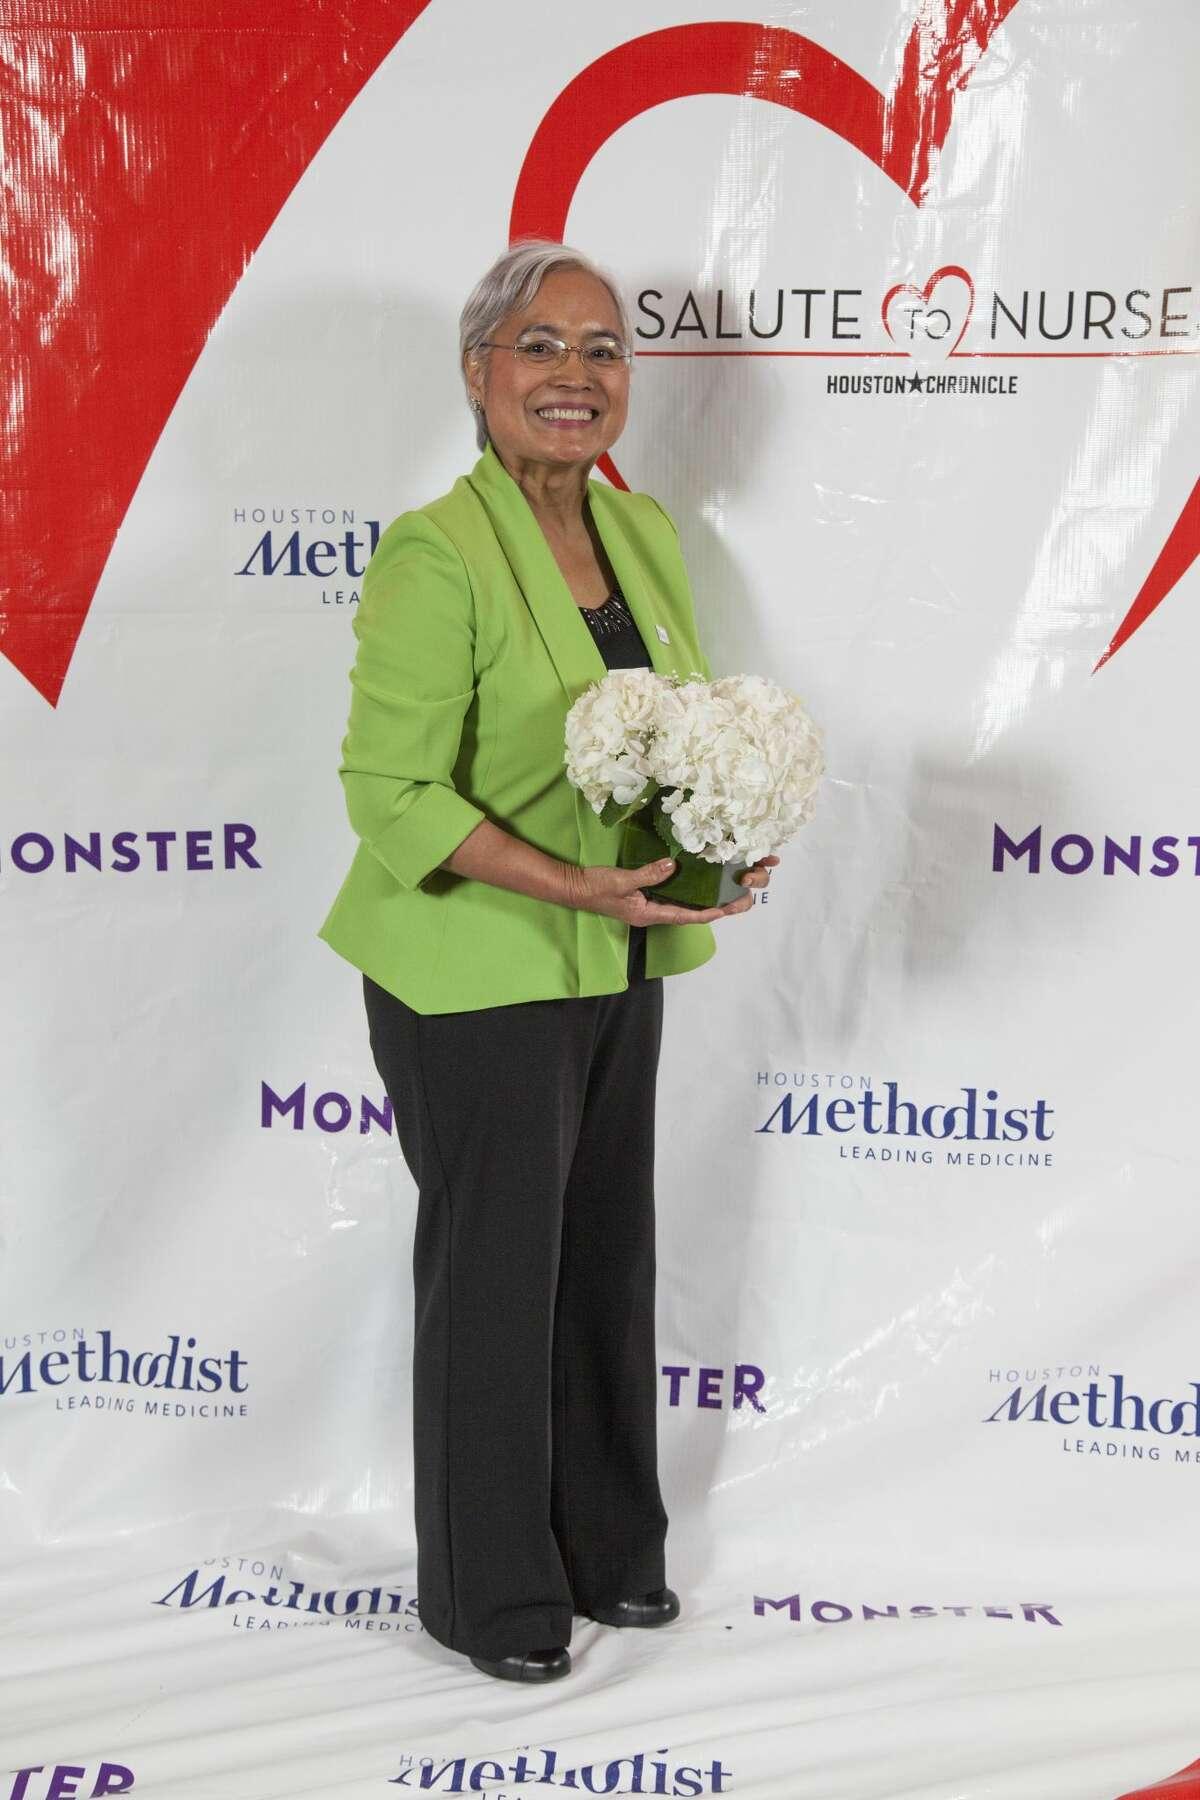 Salute To Nurses 2016 Attendees